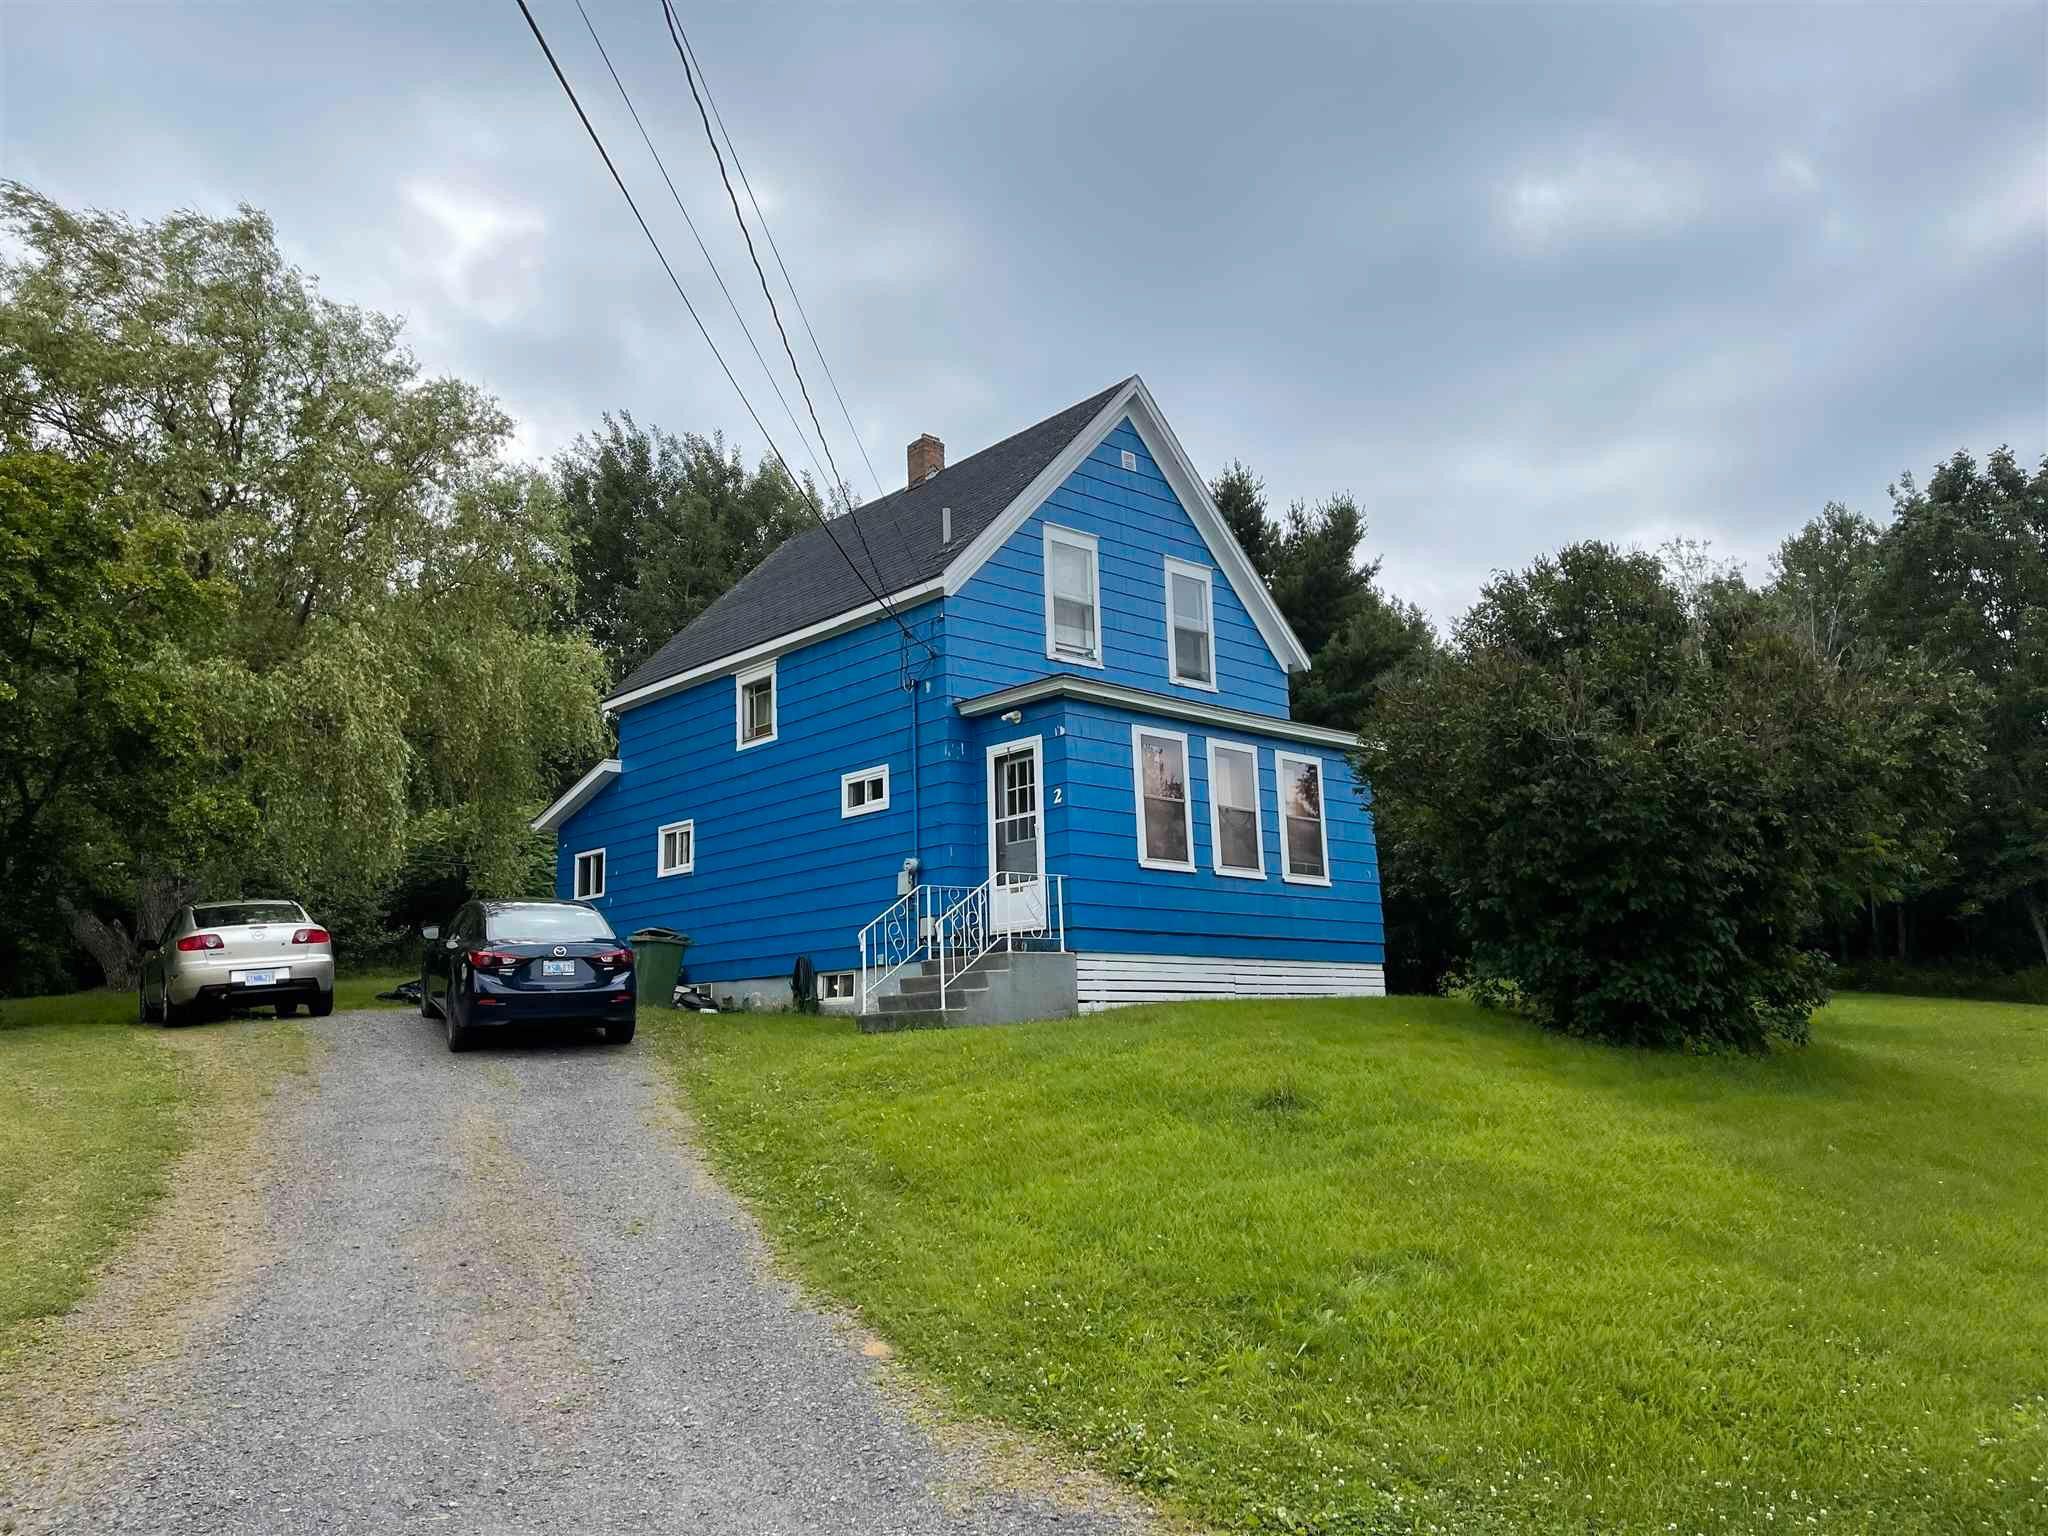 Main Photo: 2 Twelfth Street in Trenton: 107-Trenton,Westville,Pictou Residential for sale (Northern Region)  : MLS®# 202118269